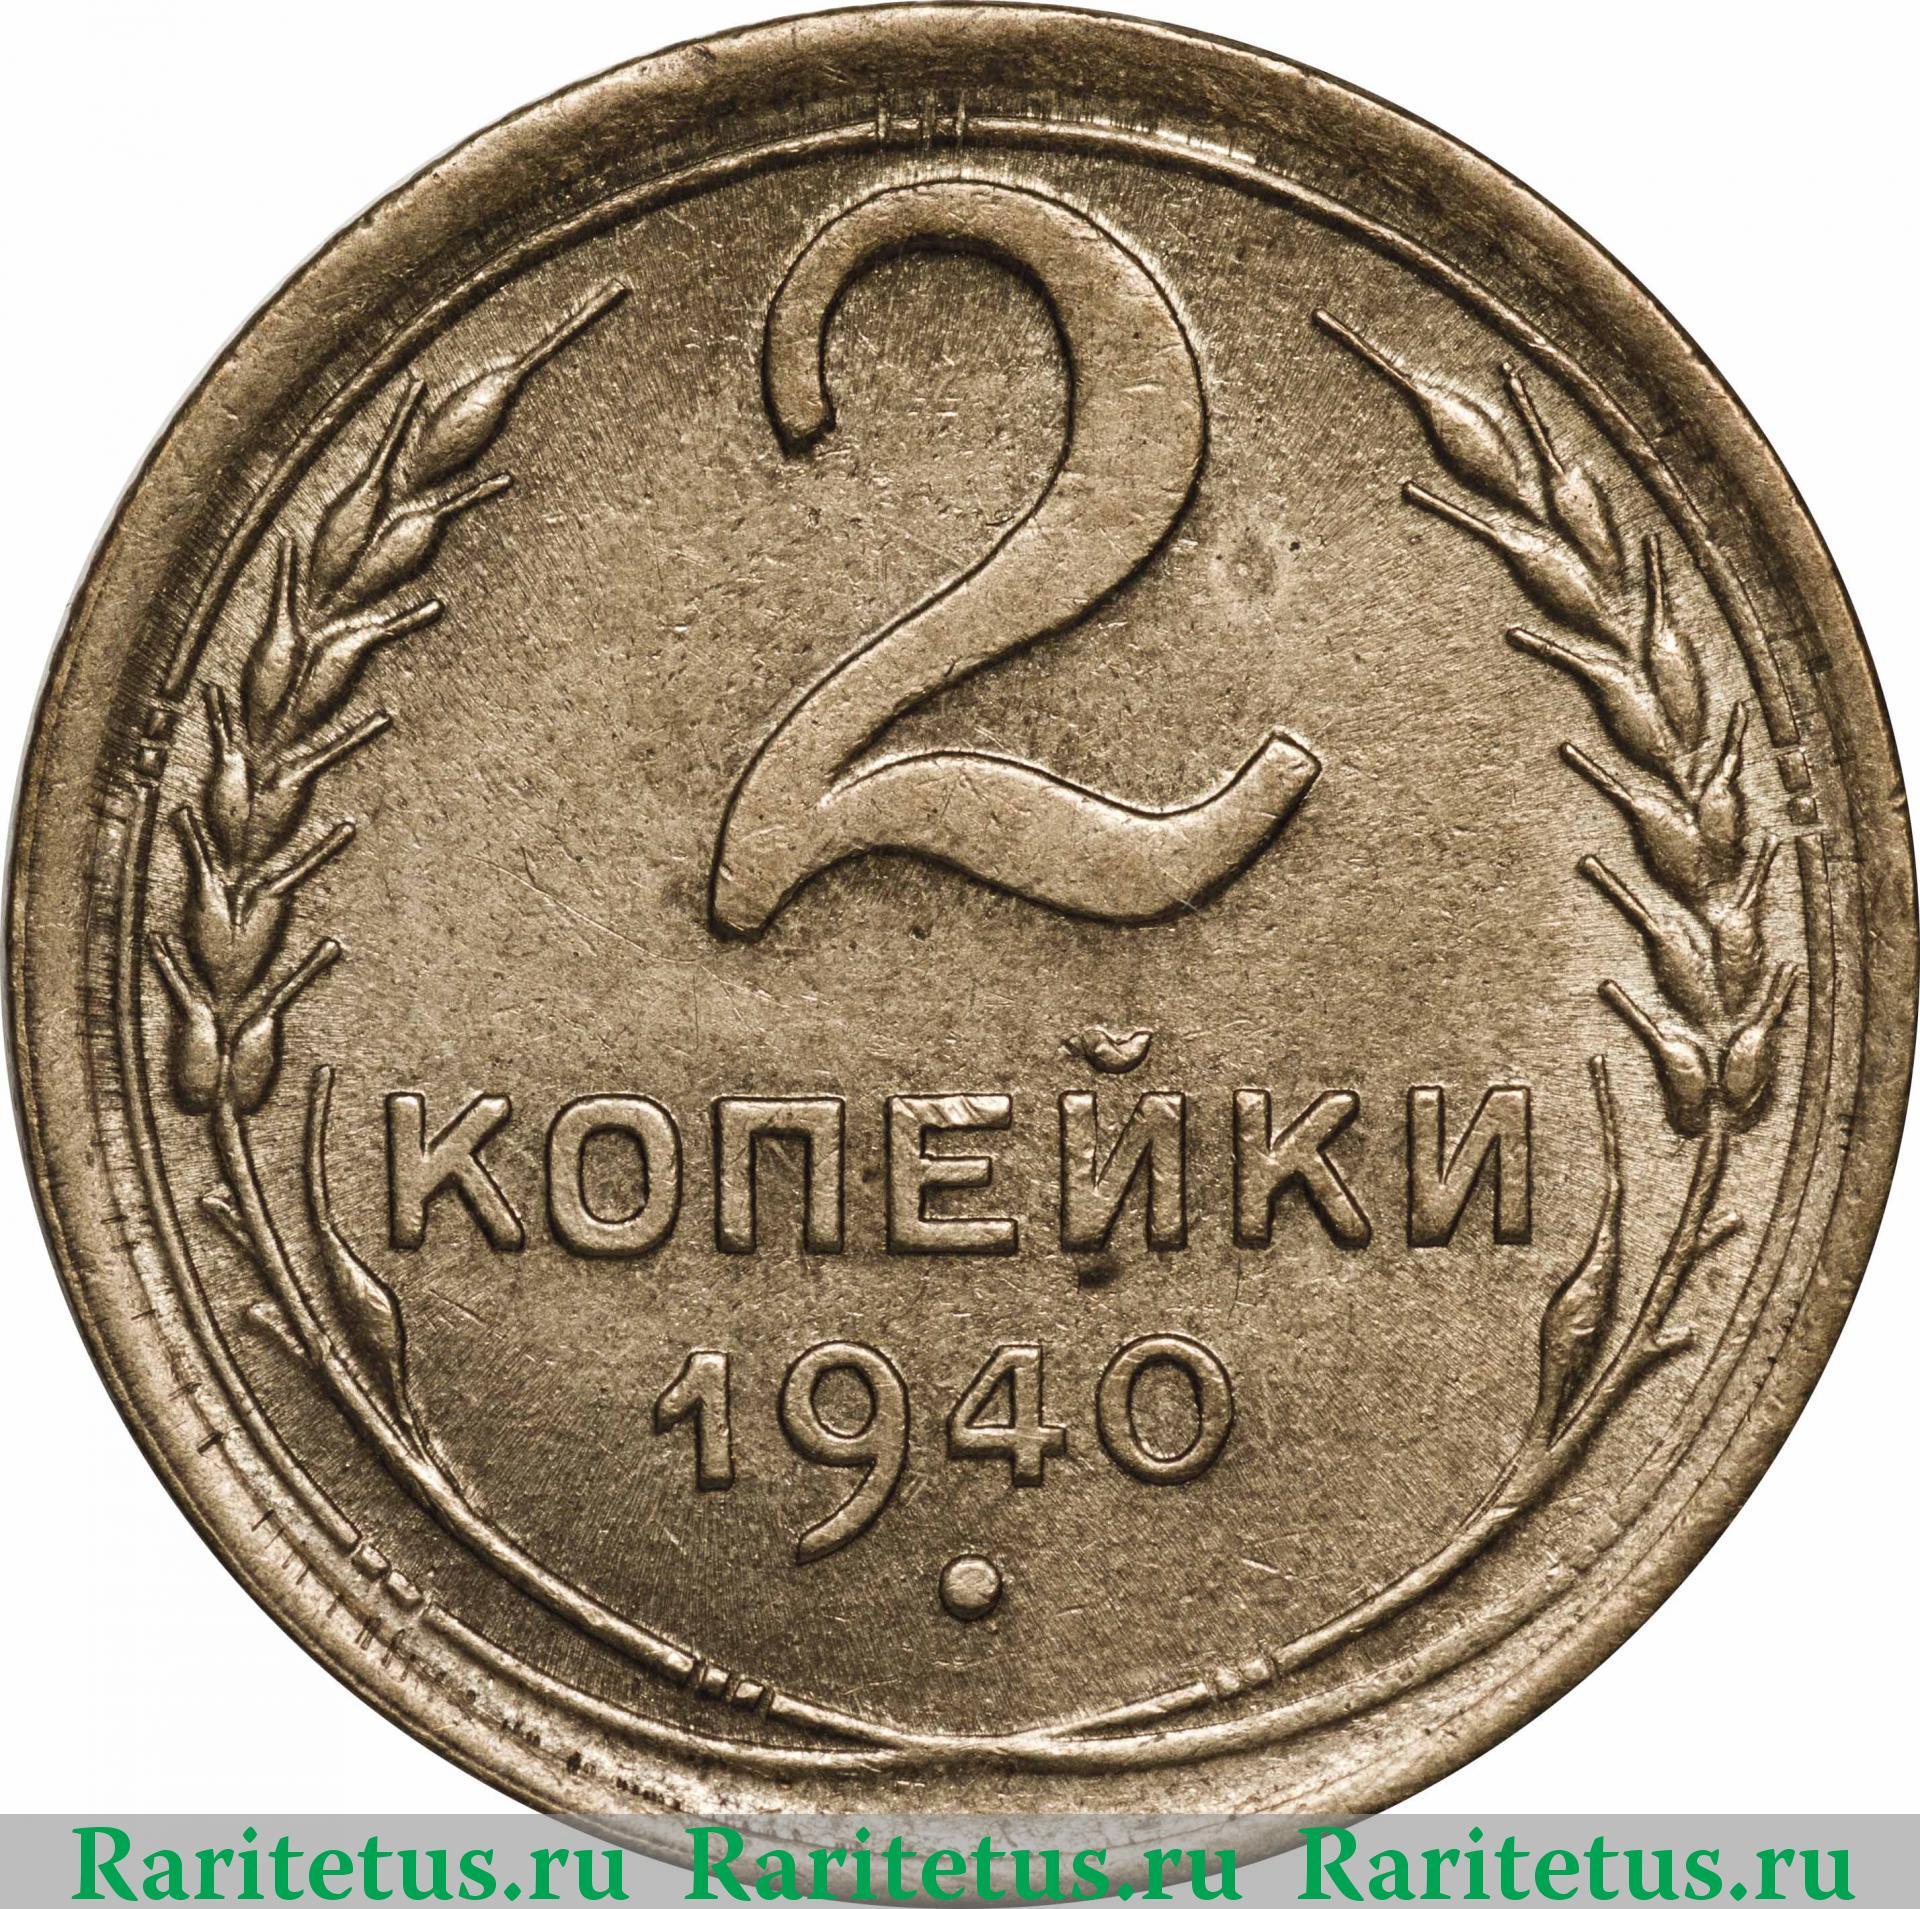 Советские монеты 2 копейки серебряная монета елизавета 2 цена